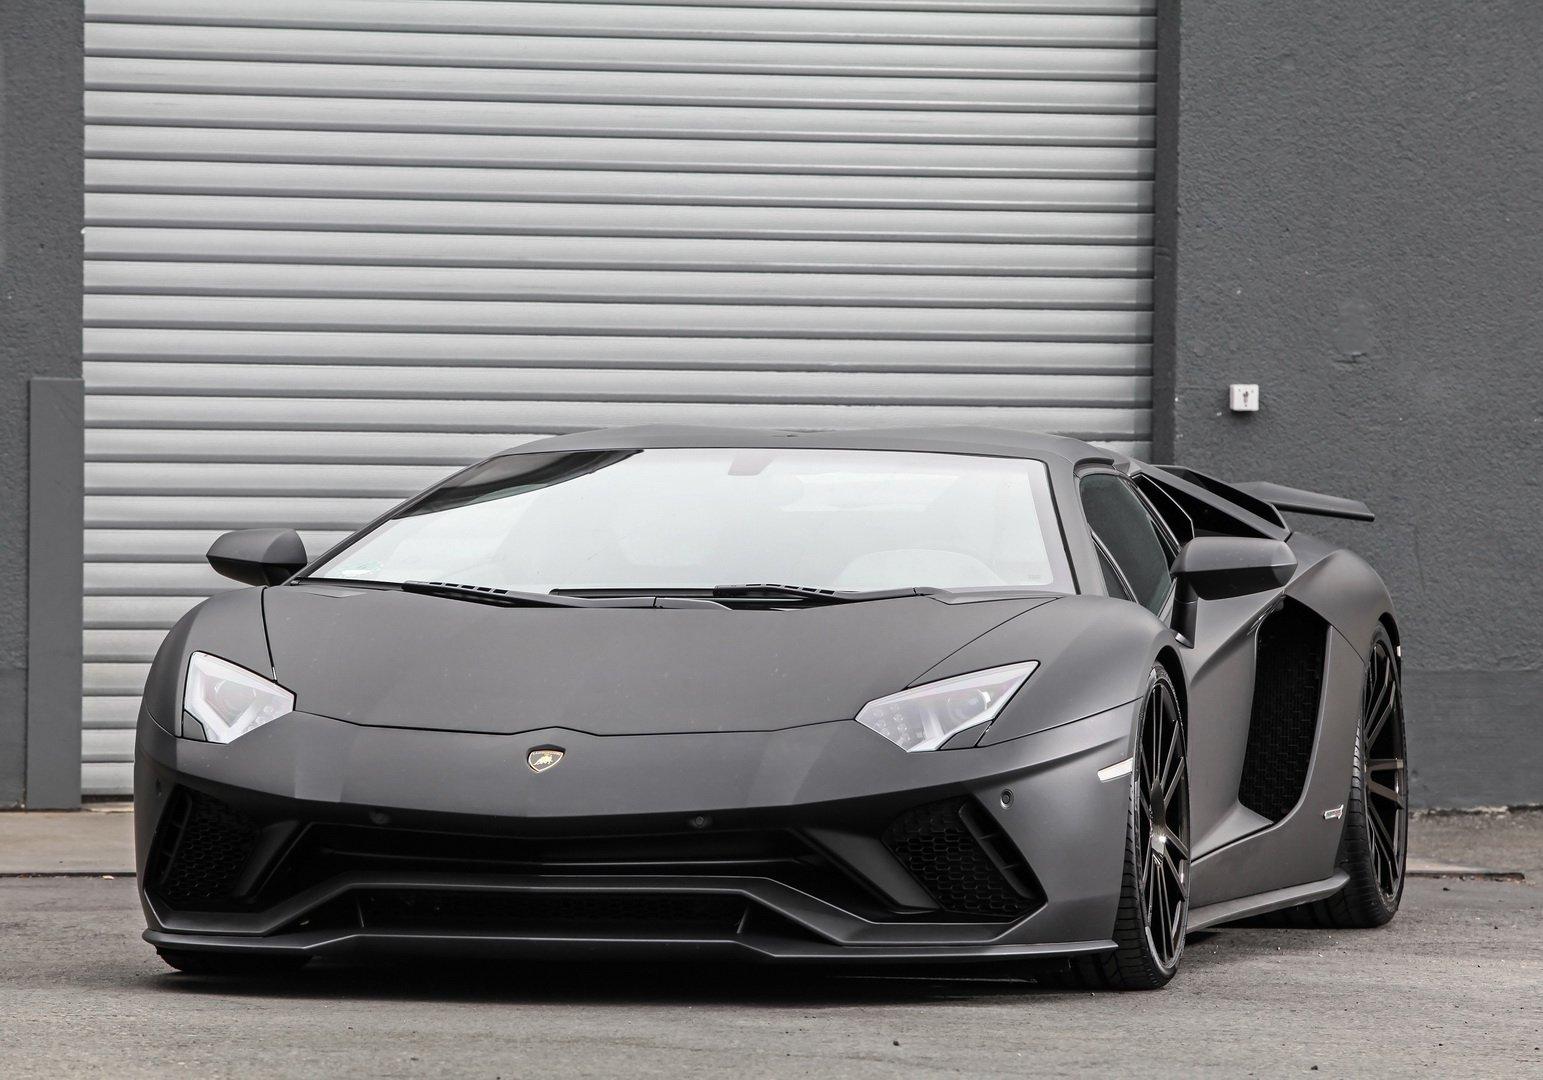 Lamborghini Aventador S Roadster by Wheelsandmore (5)